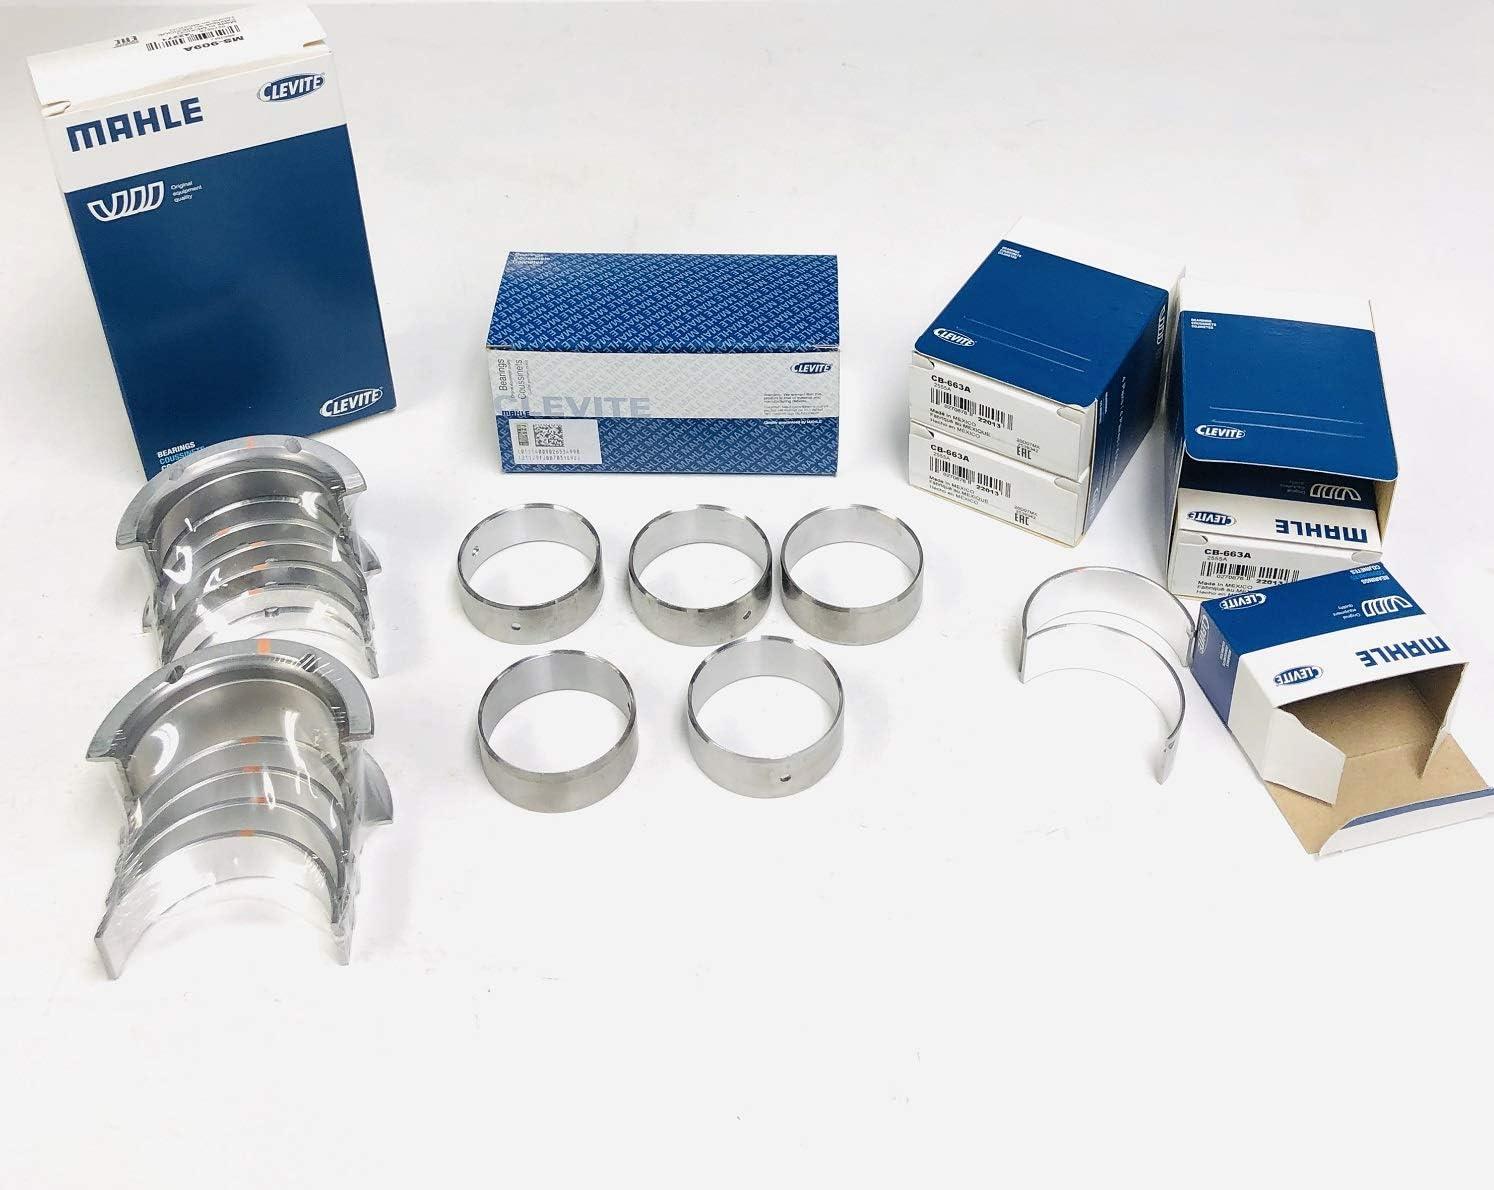 Clevite A series Engine Rod /& Main Bearing Sets compatible with 1999-10 4.8L 5.3L 6.0L VORTEC Chevy LS Standard Size